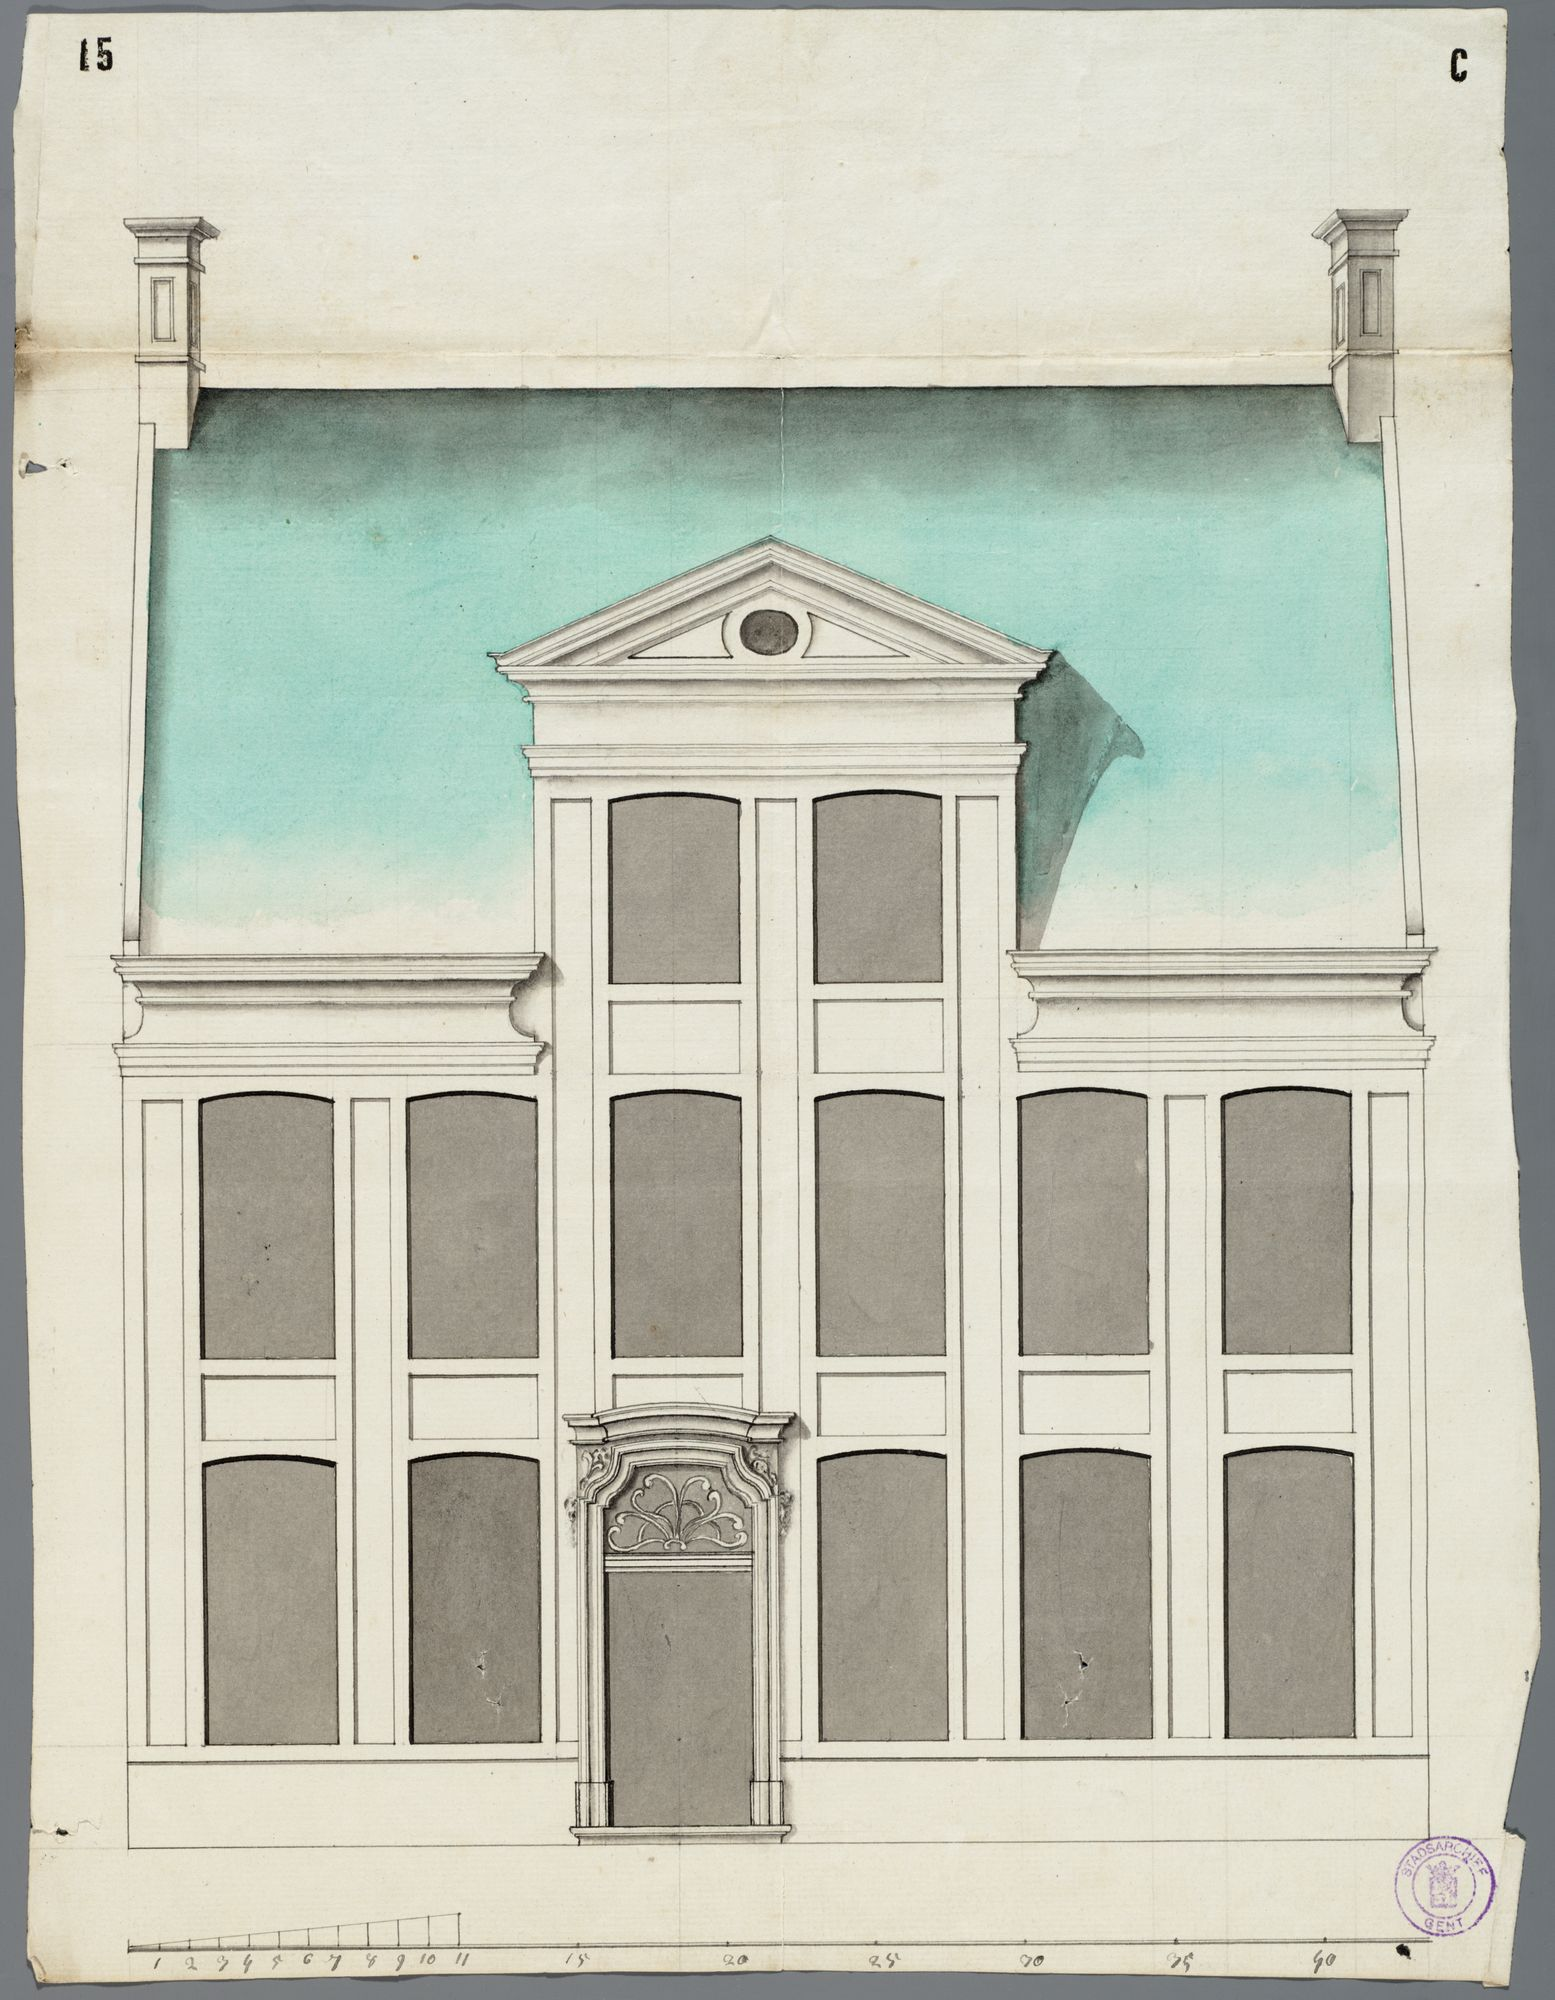 Gent: Nederpolder, 1769: opstand gevel